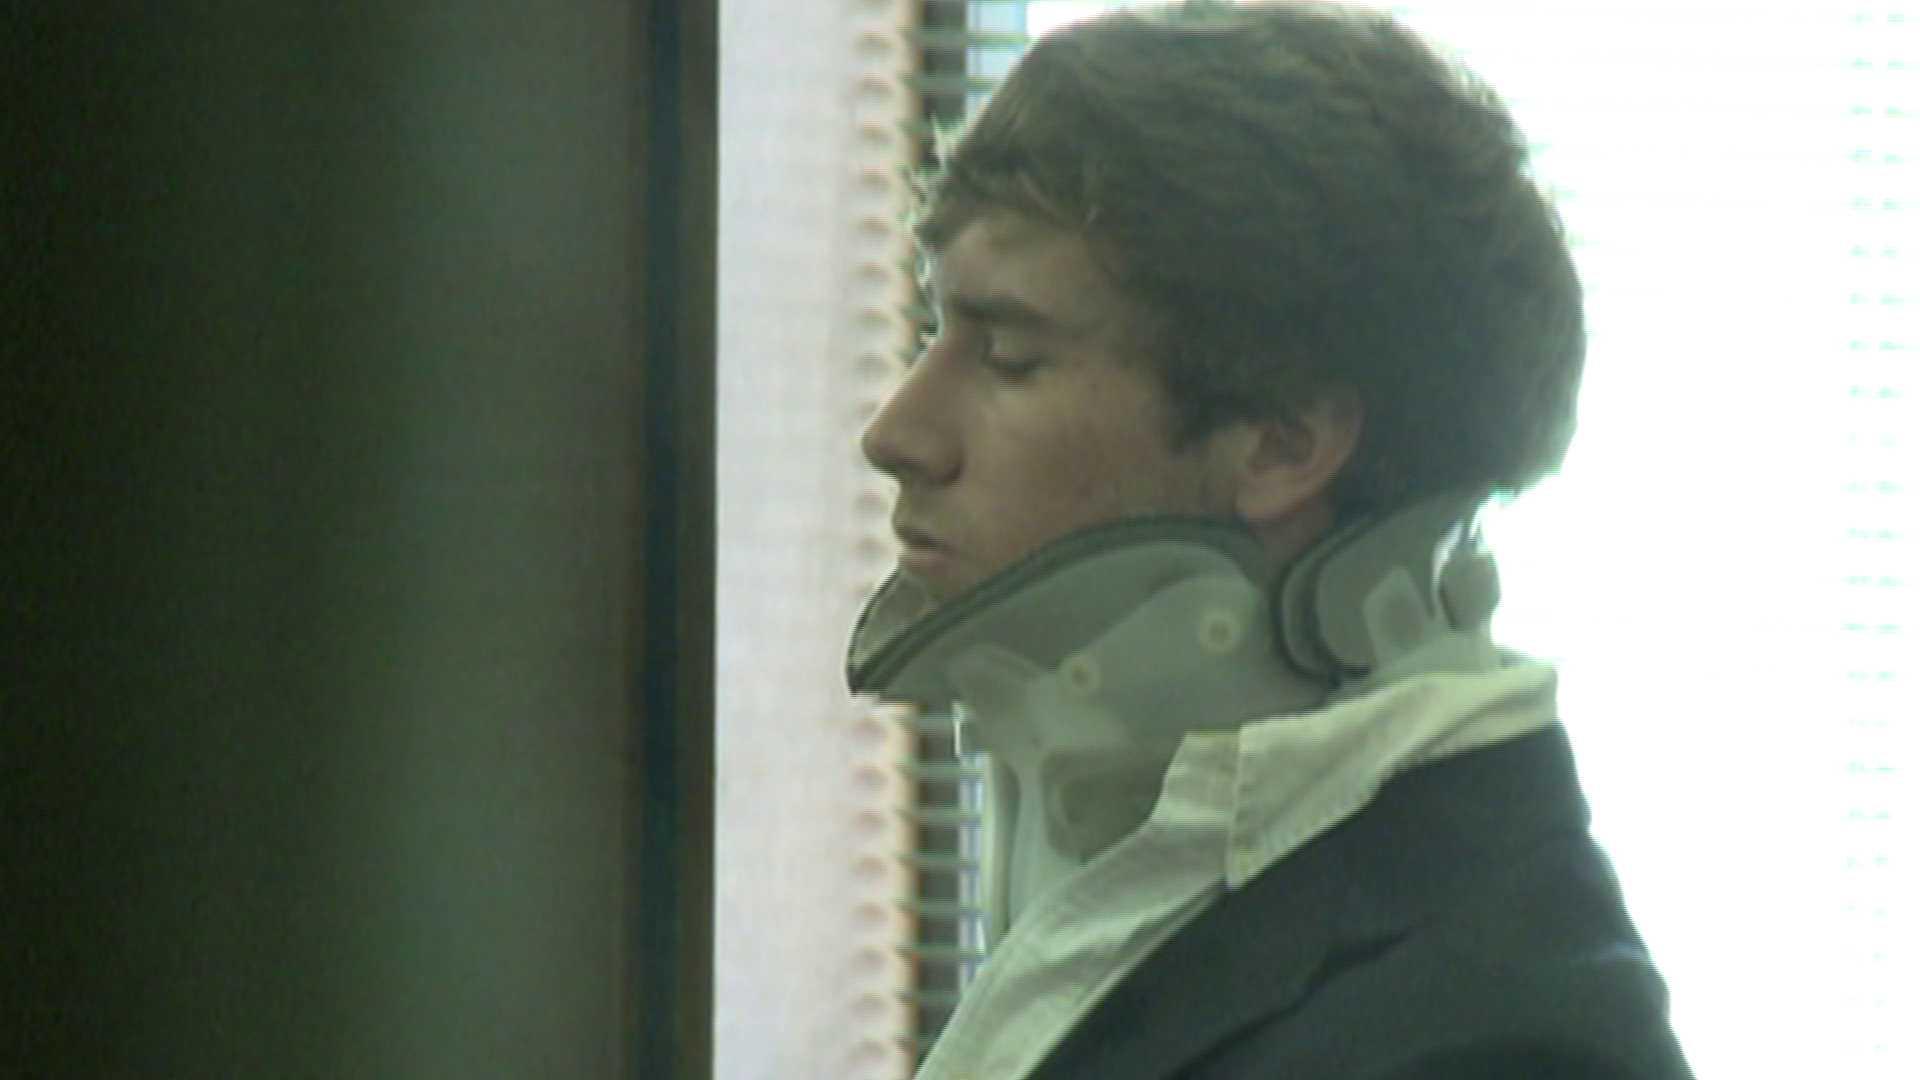 Holdsambeck Trial Date Set